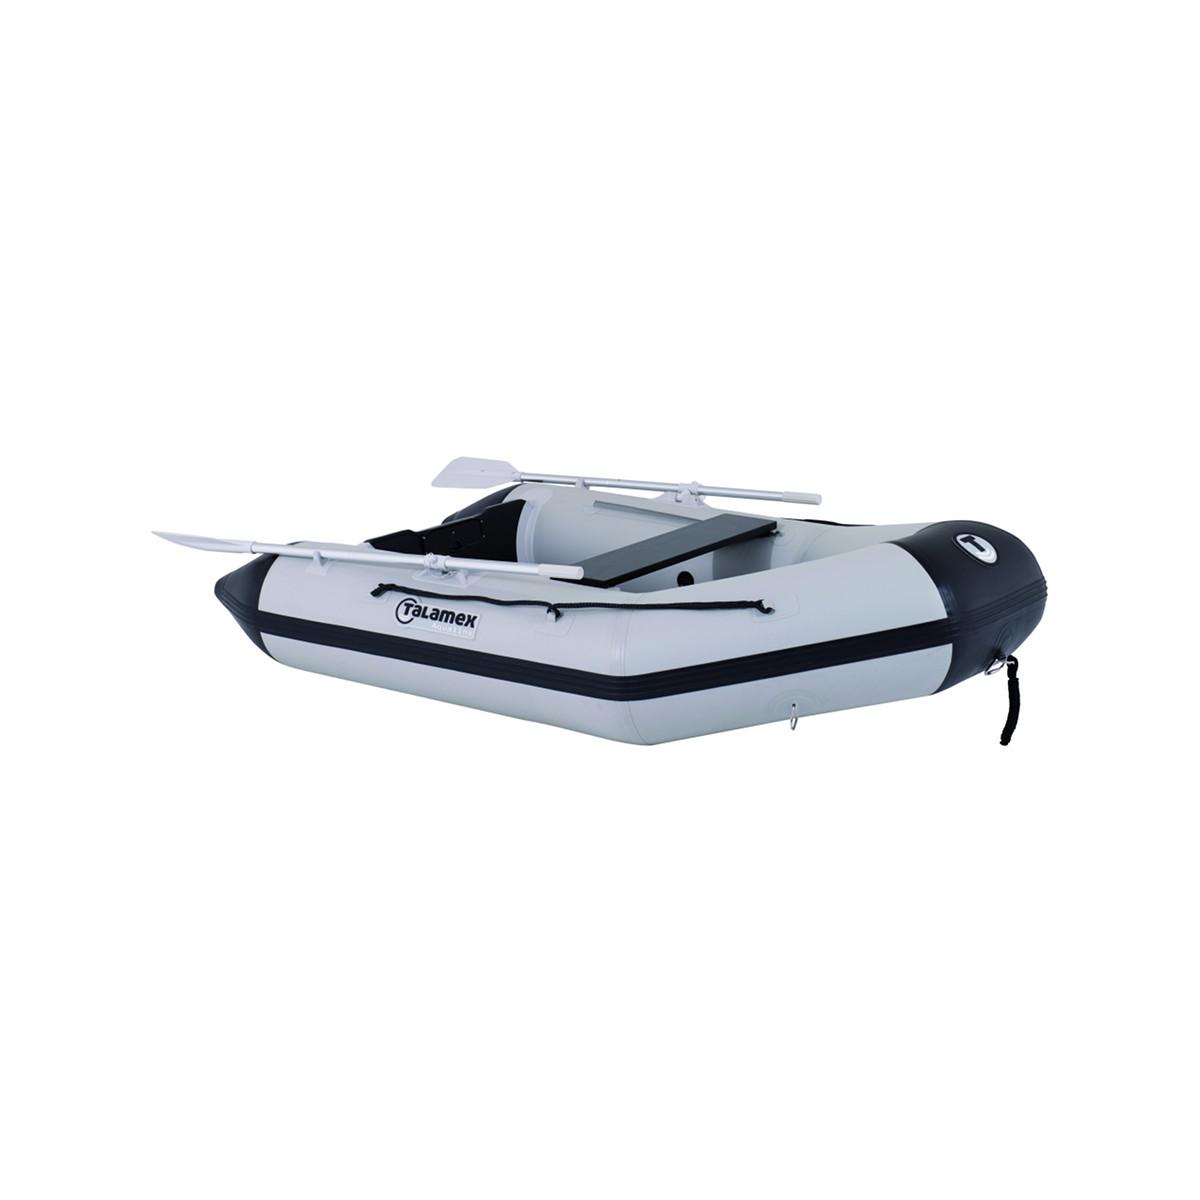 Talamex Aqualine QLS230 opblaasbare rubberboot met lattenbodem, lengte 2,30m, grijs